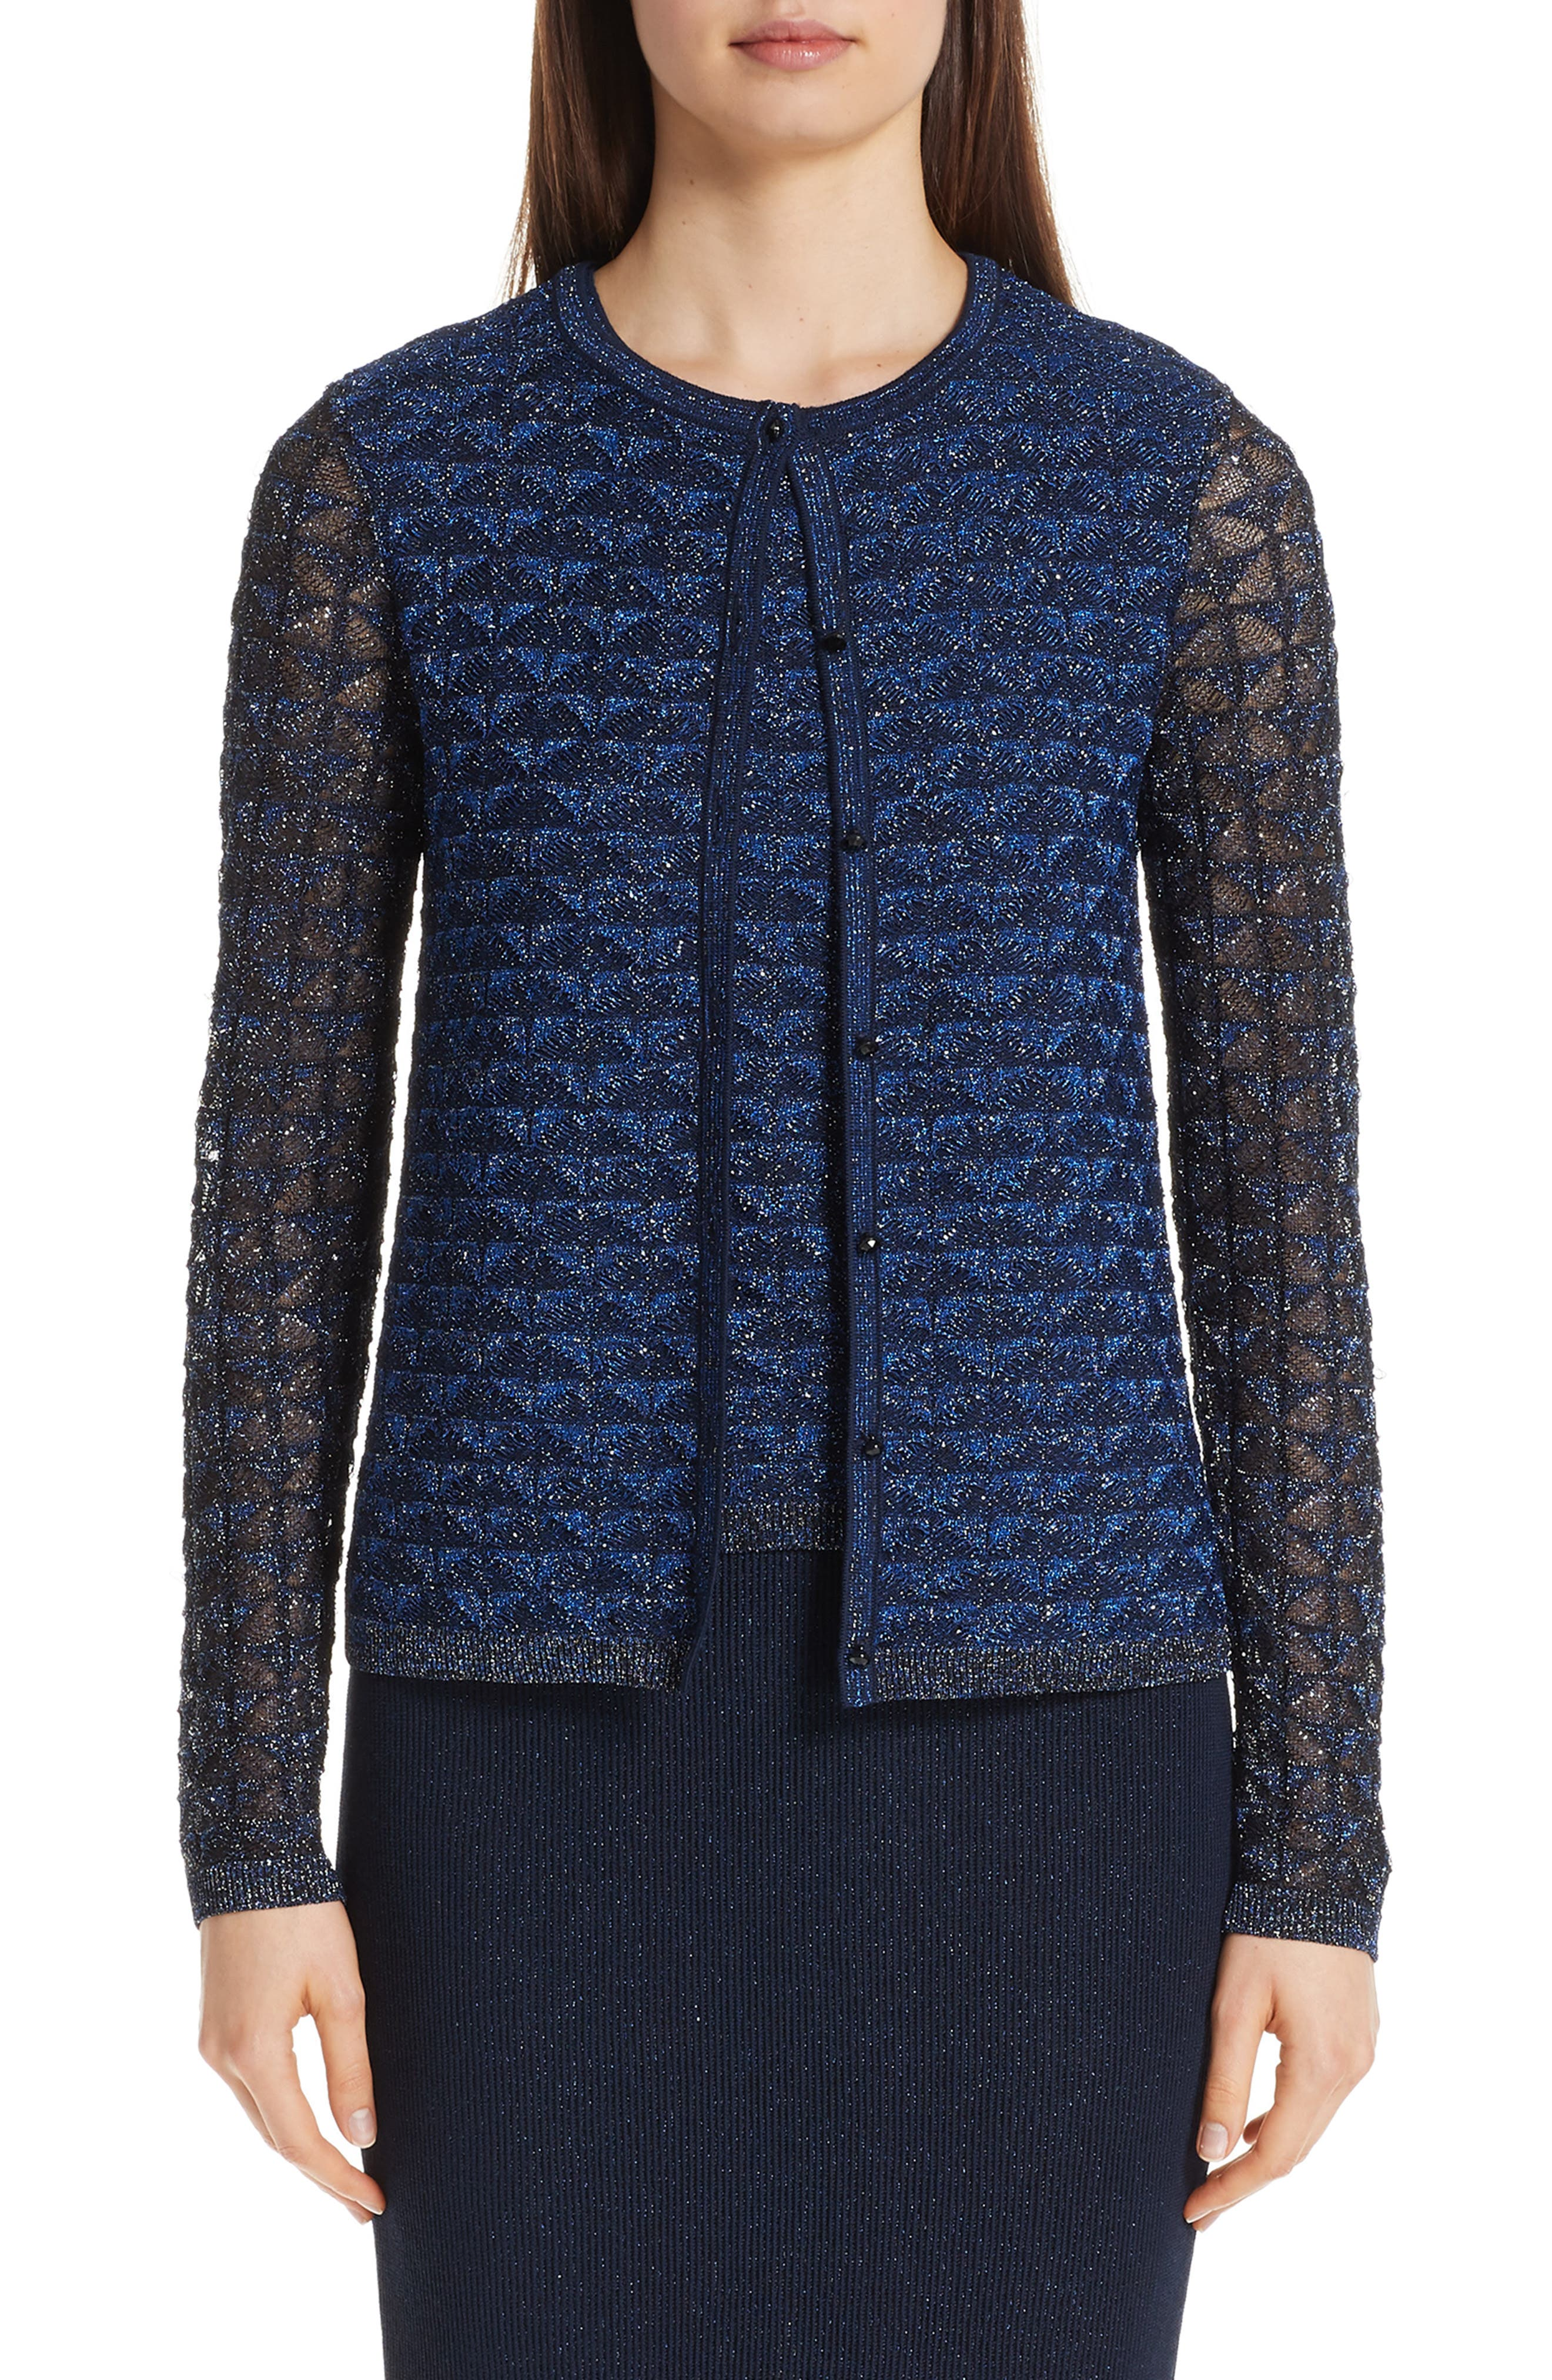 ST. JOHN COLLECTION Diamond Lace Knit Cardigan, Main, color, NAVY MULTI